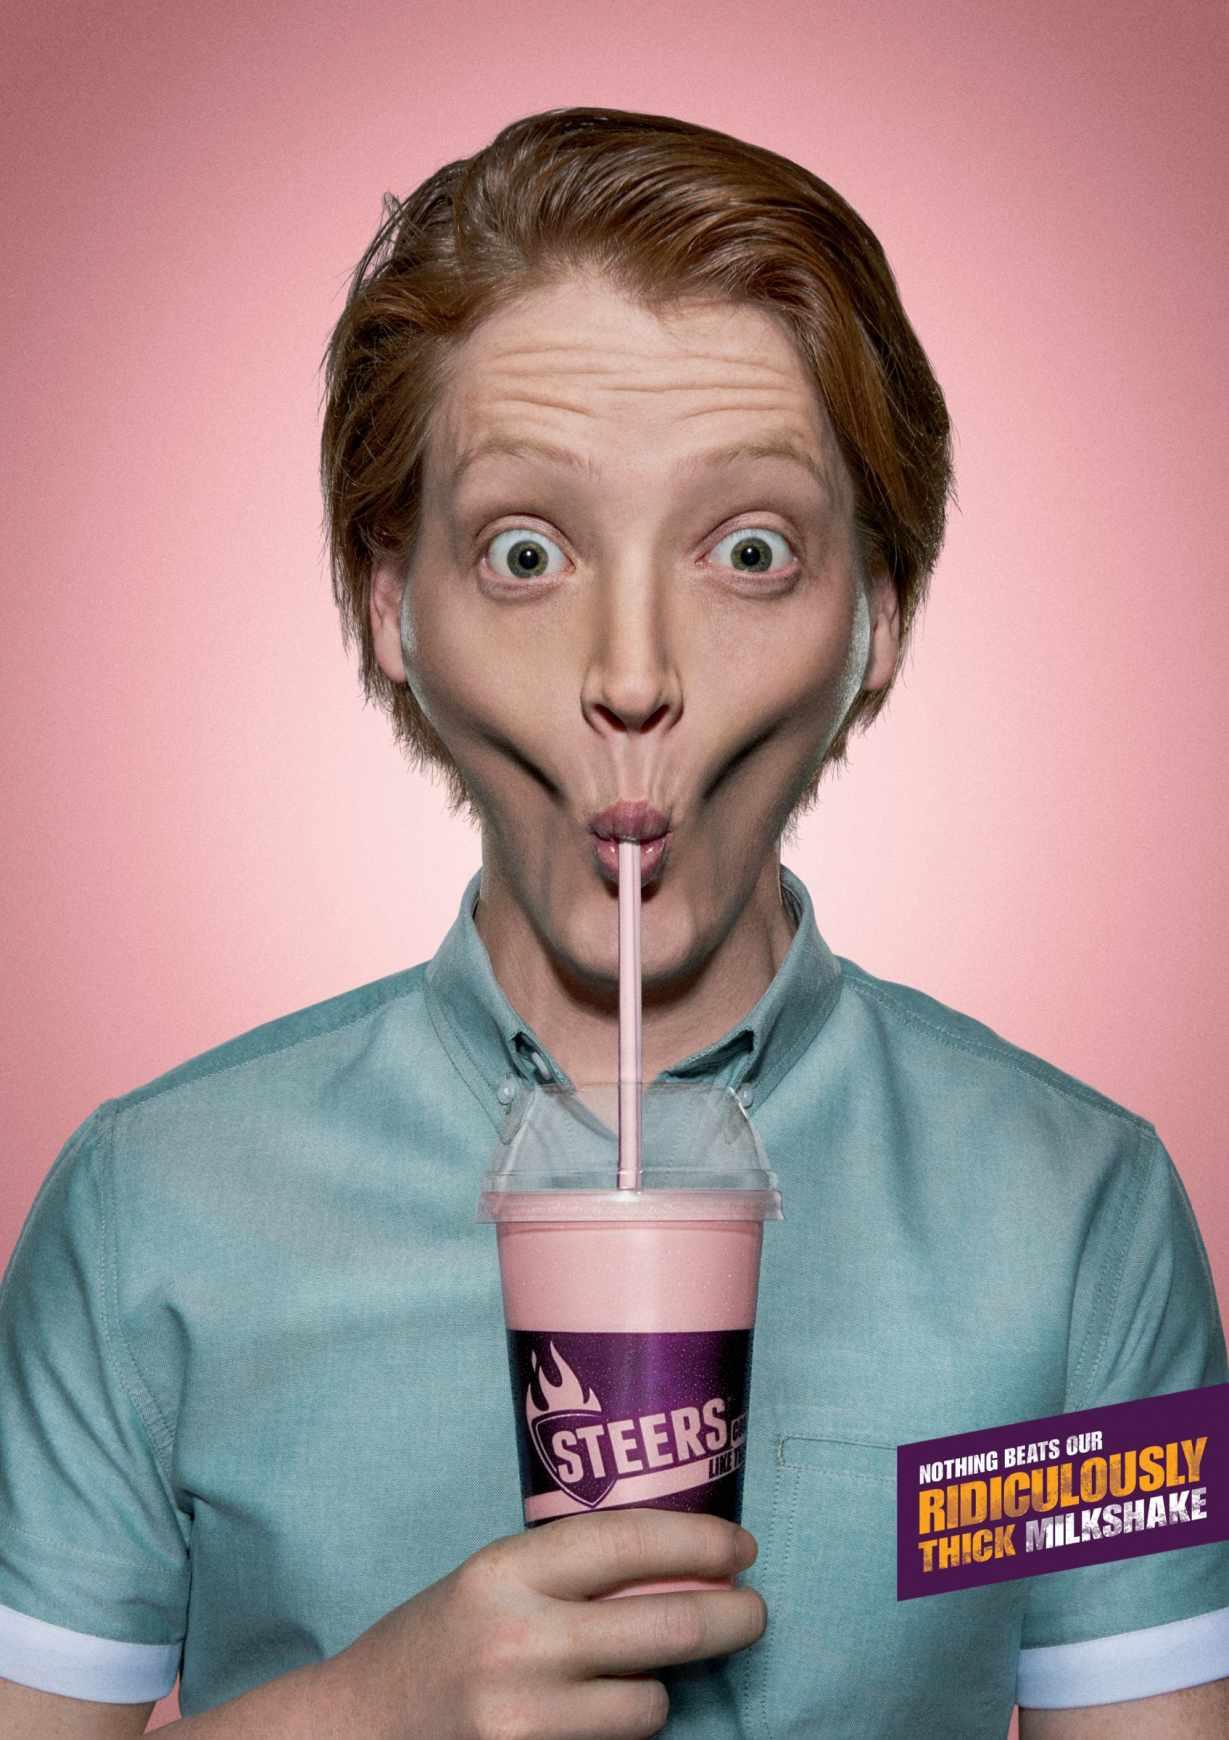 steers_milkshake_posters4_matt_aotw